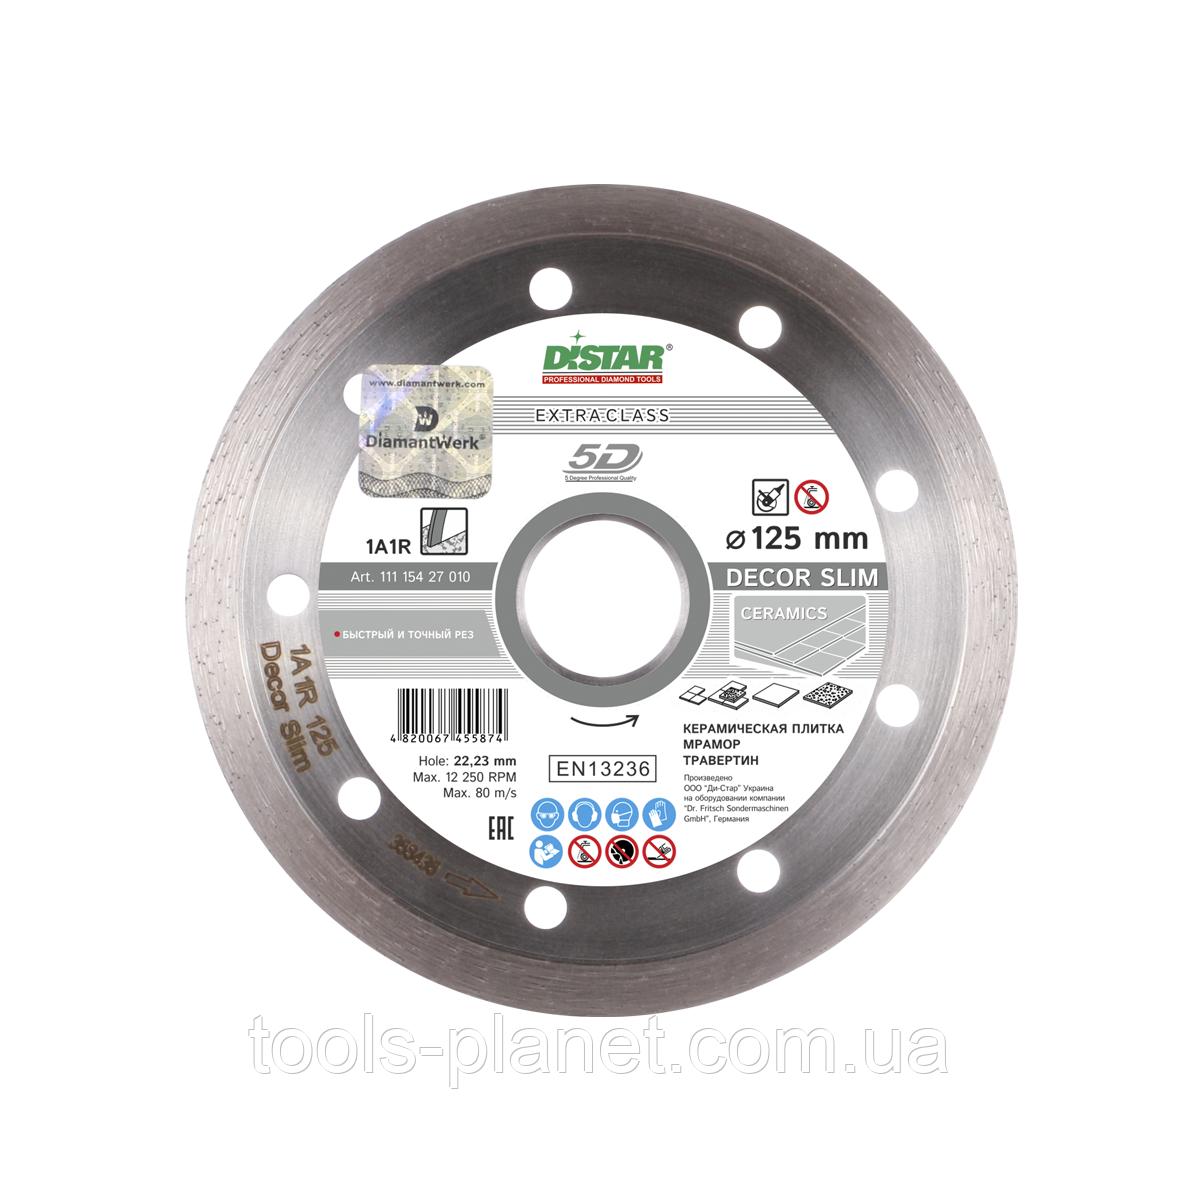 Алмазний диск Distar 1A1R 115 x 1,2 x 8 x 22,23 Decor Slim 5D (11115427009)